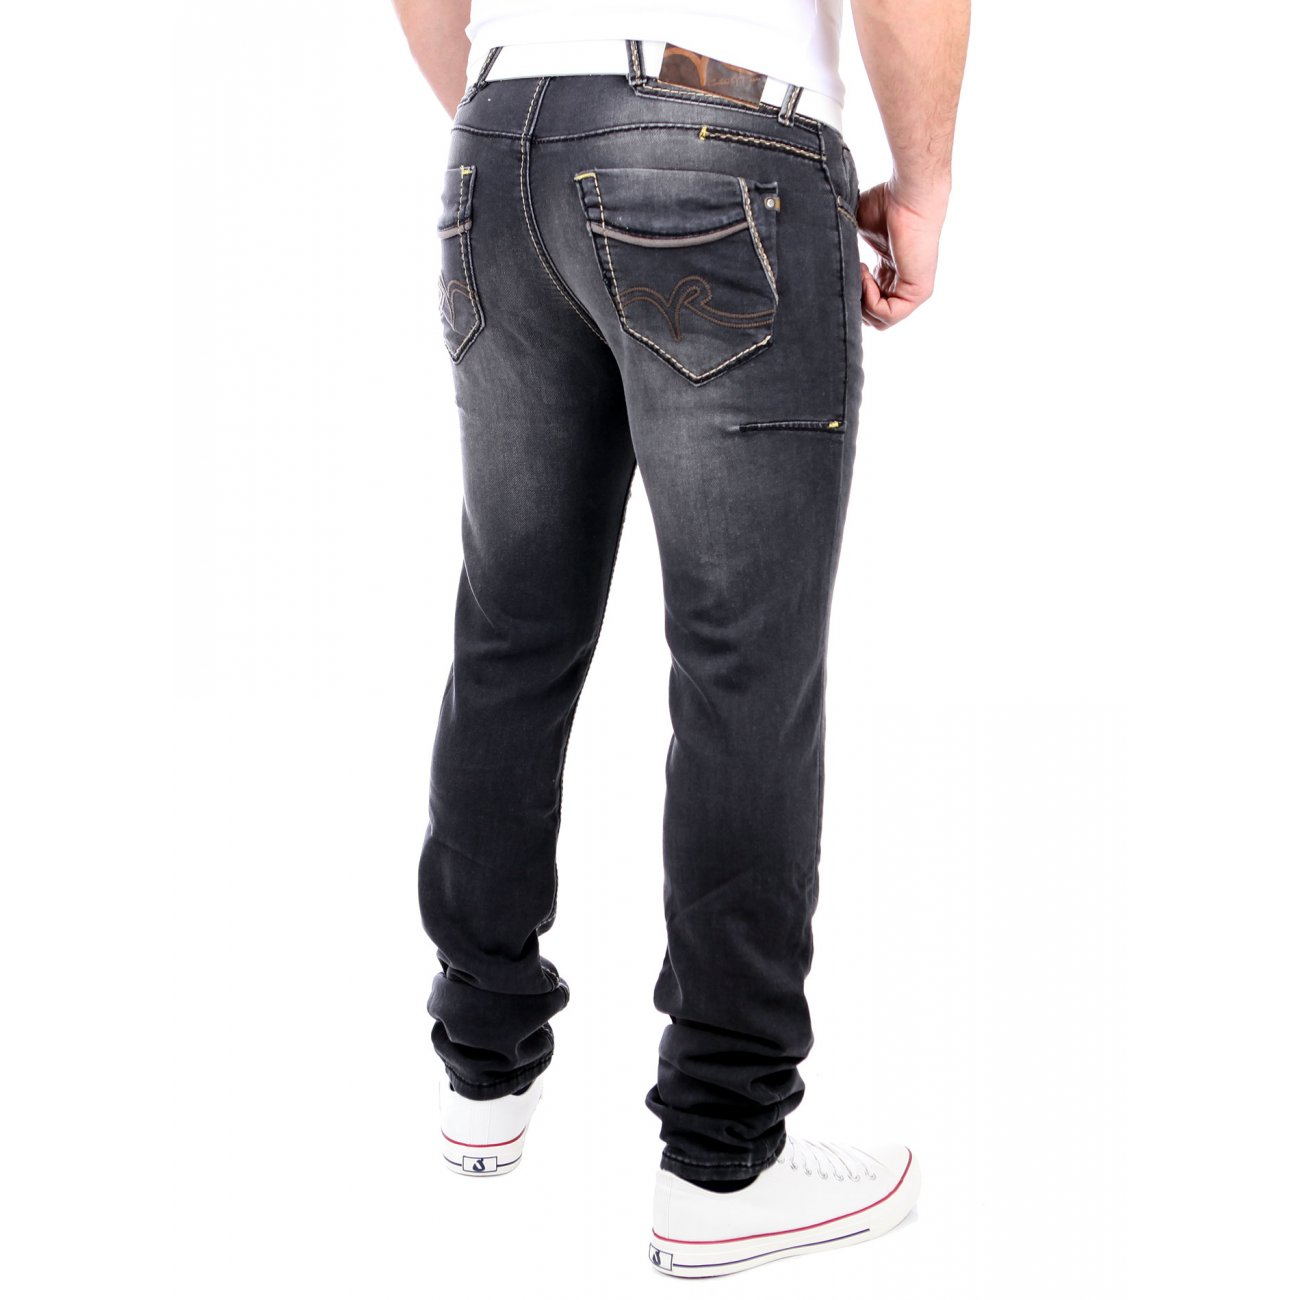 rusty neal jogg jeans herren used look jogging jeans hose rn 7627 4 s. Black Bedroom Furniture Sets. Home Design Ideas